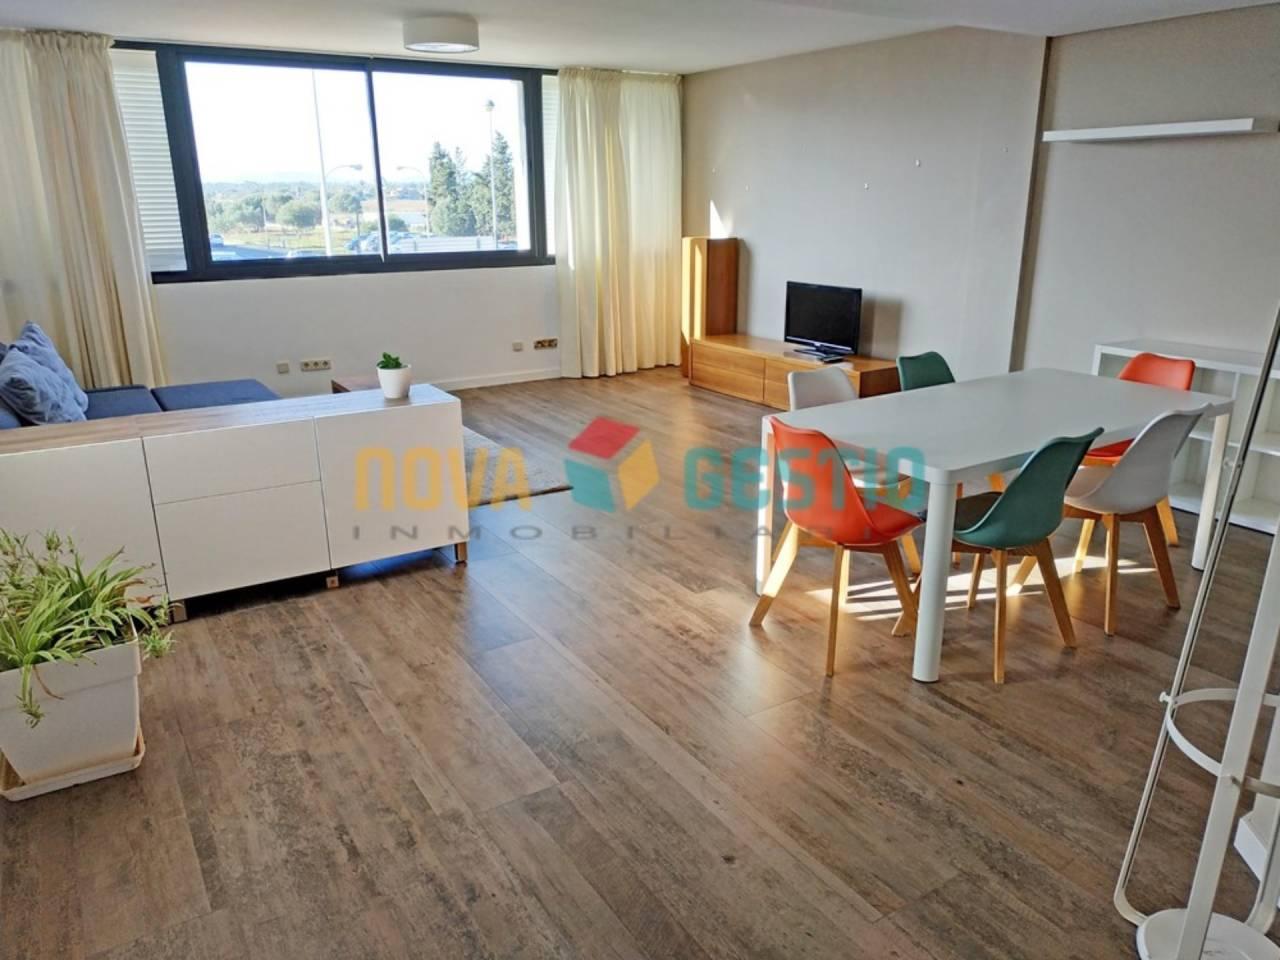 Affitto Appartamento  Cala millor. ¡disponible a partir del 1 de febrero de 2020, solo alquiler de